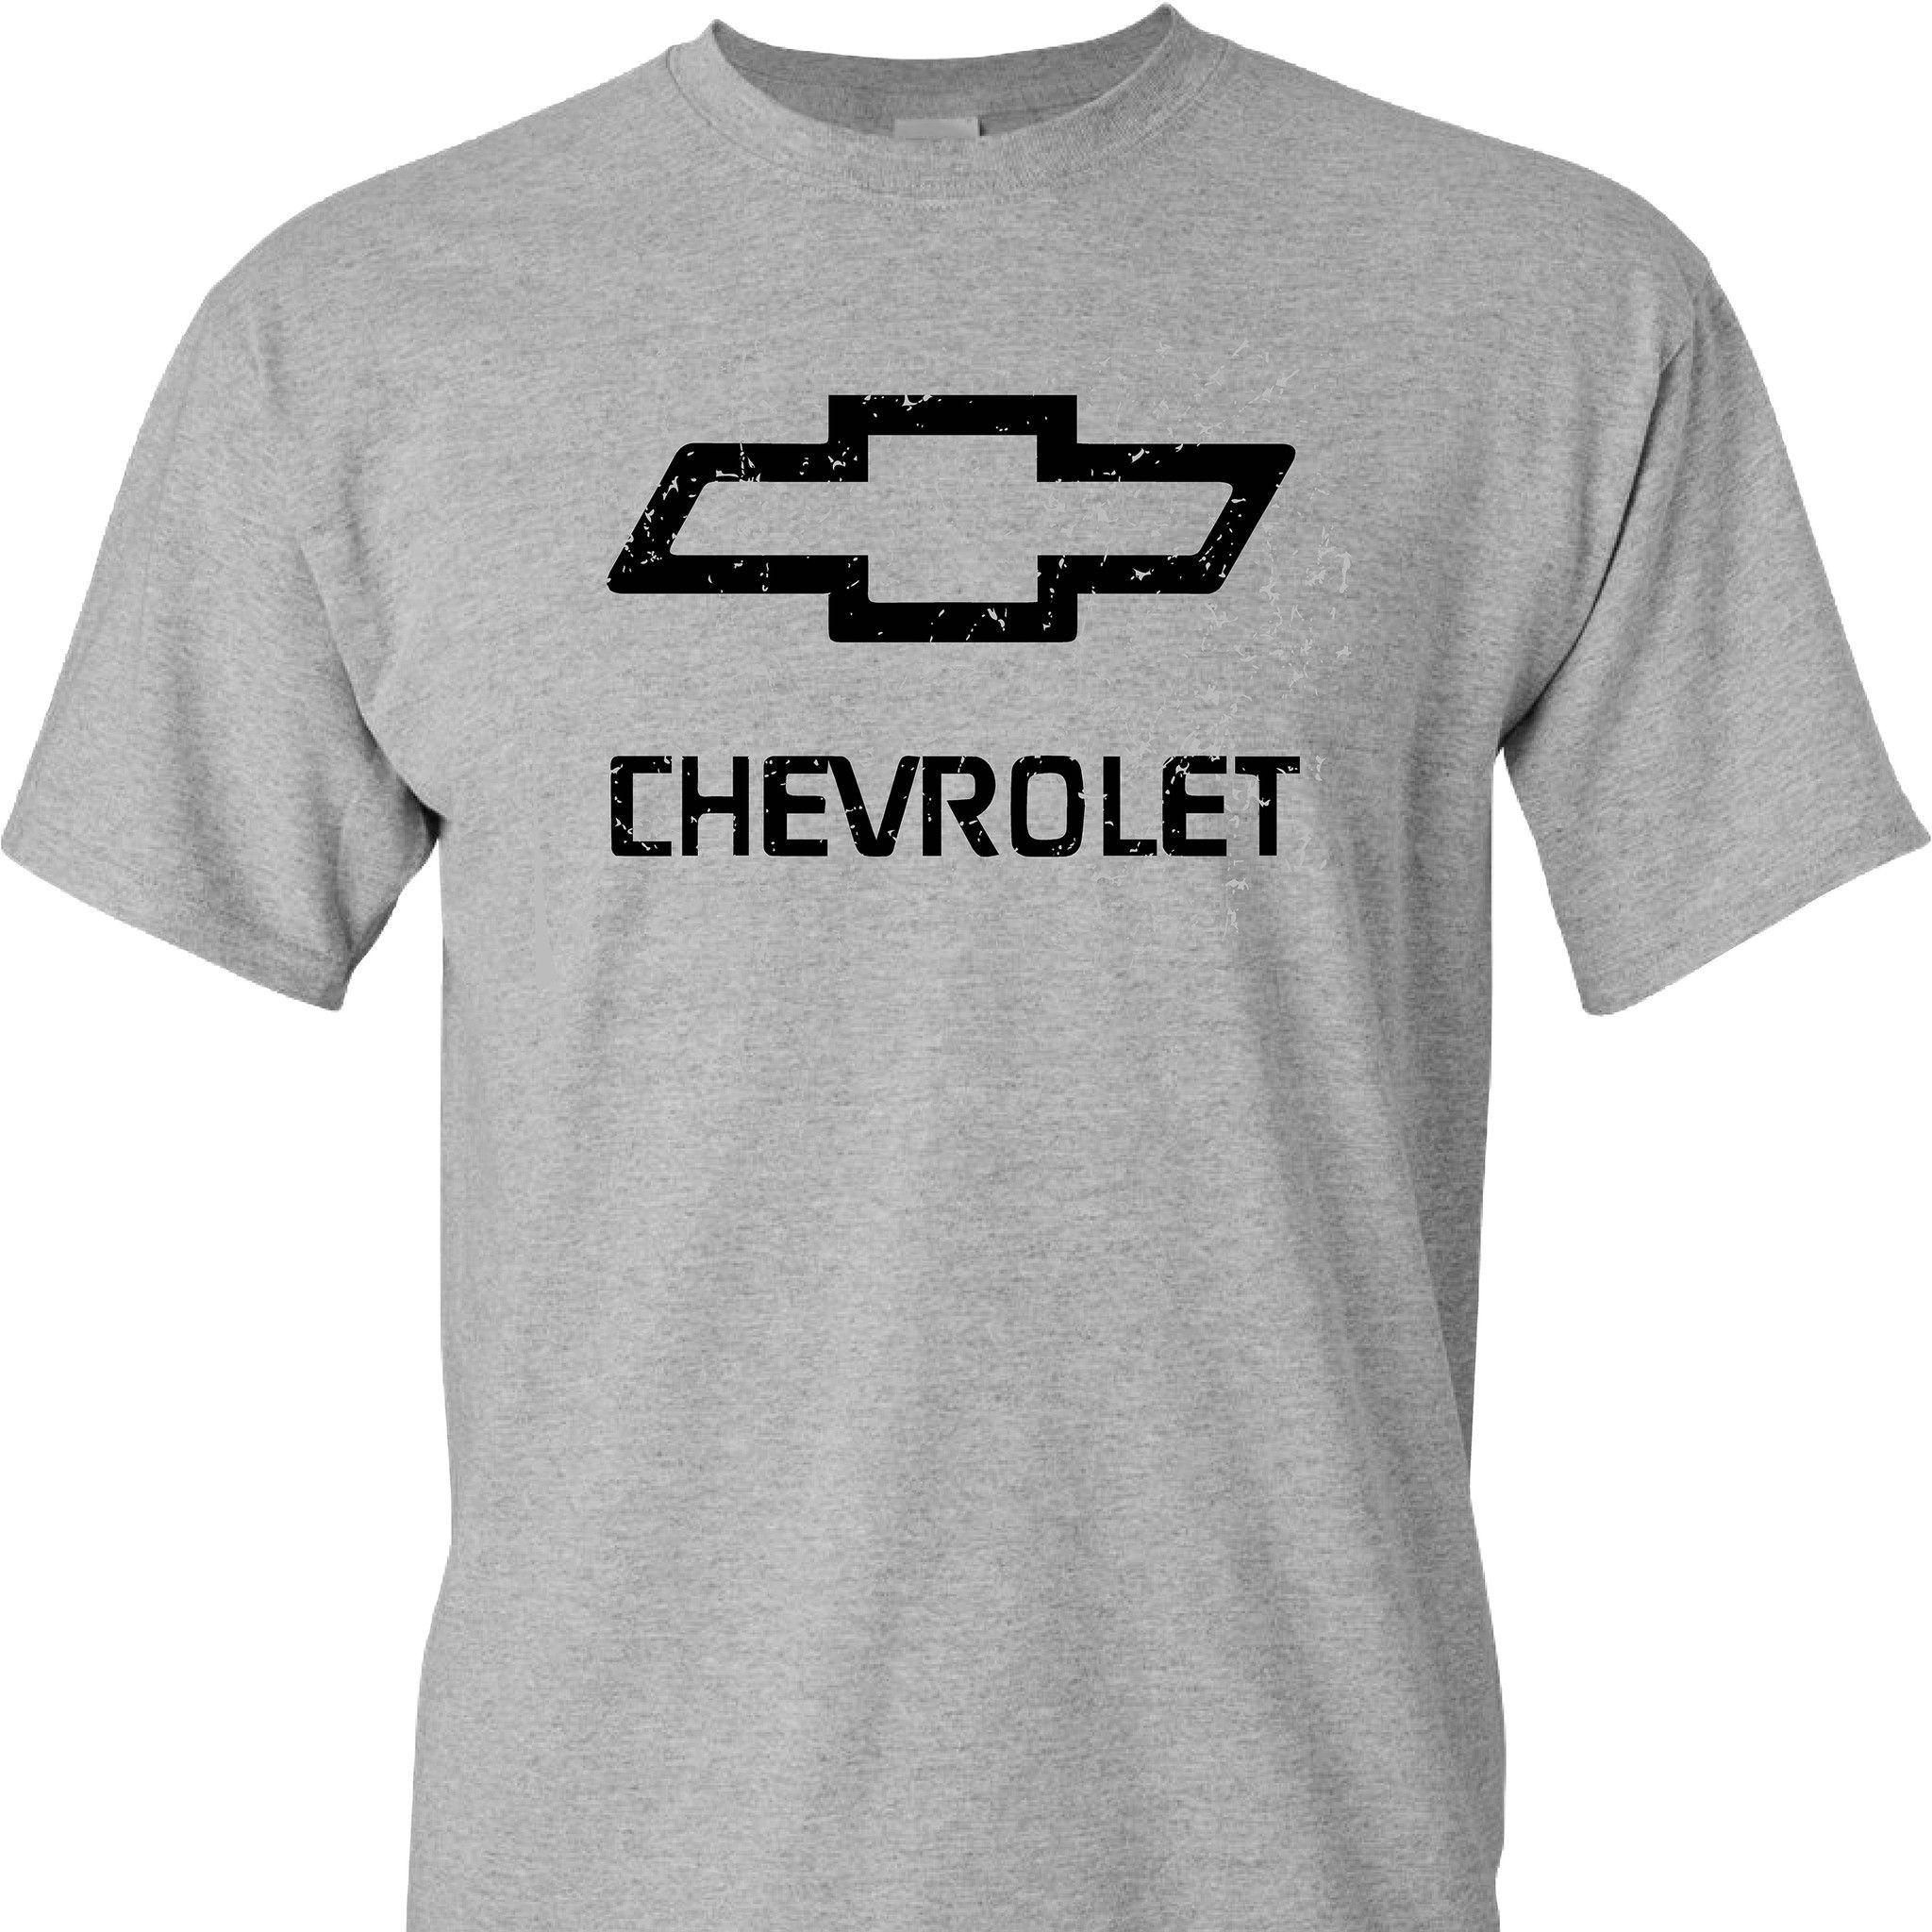 Chevy Chevrolet Logo Distressed Vintage Print On A Sport S Grey T Shirt Sports Shirts Shirts T Shirt